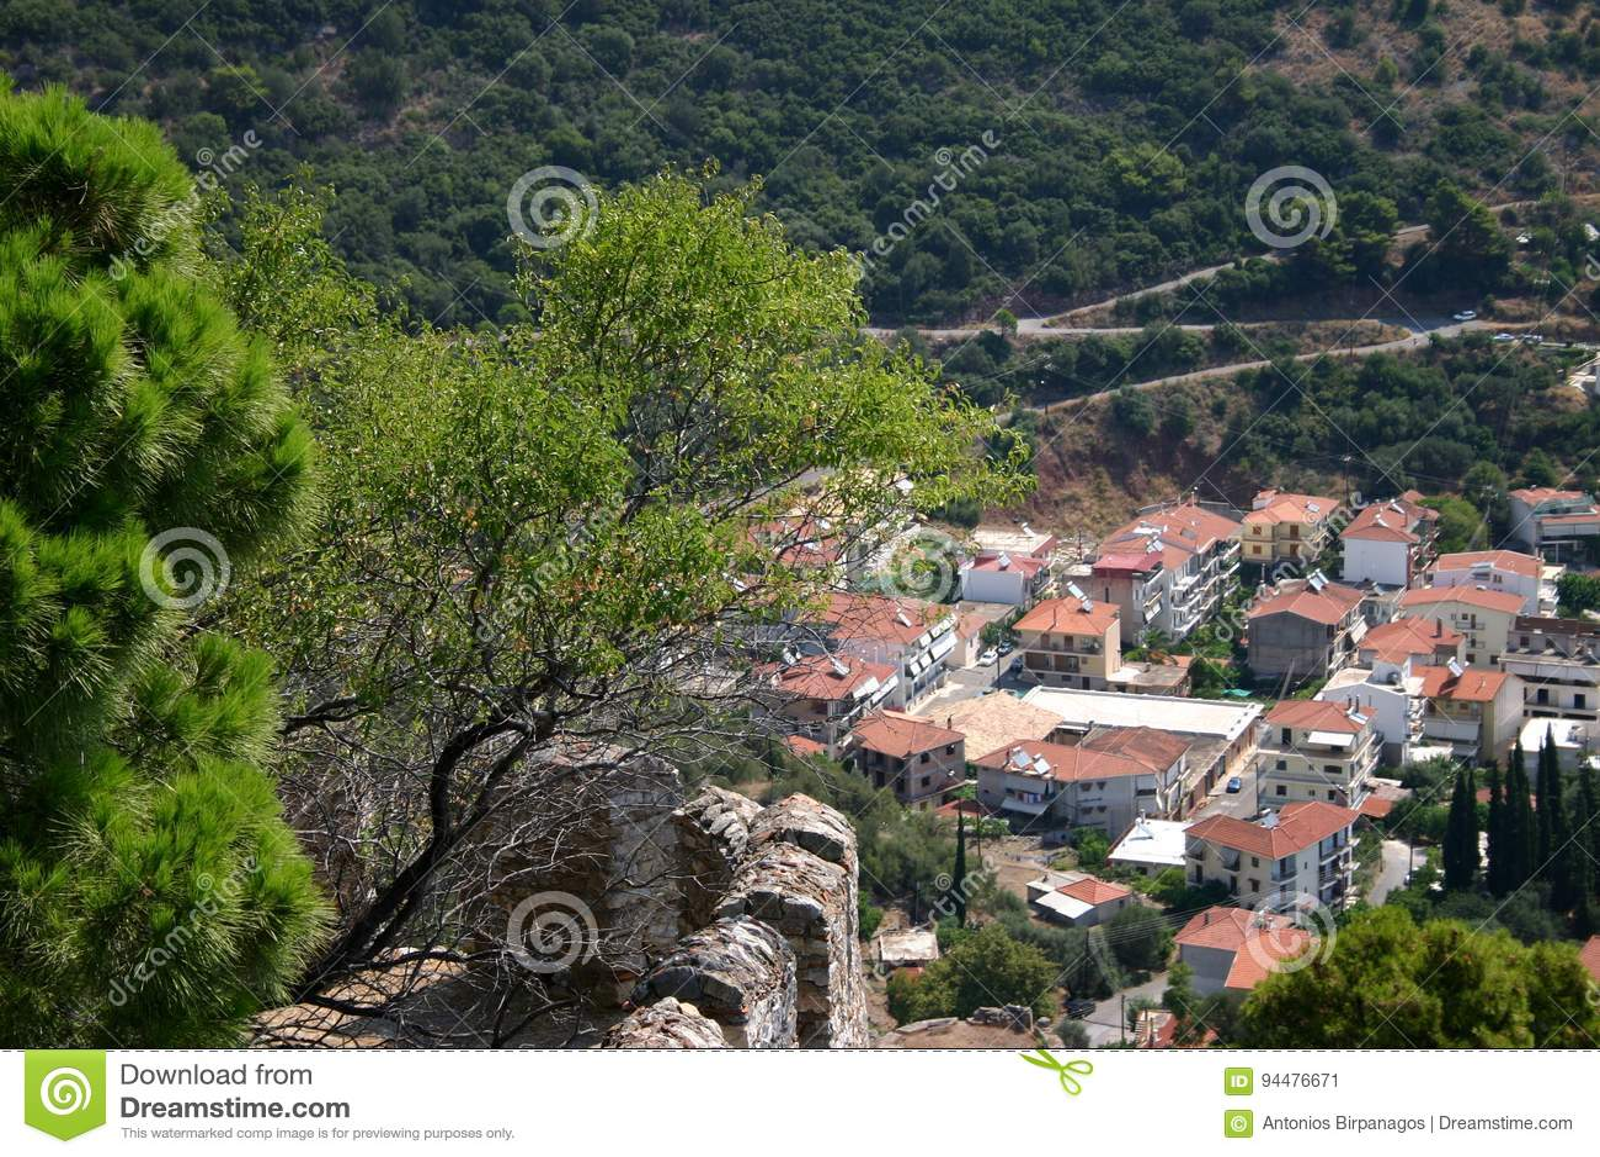 Vista ενός παραδοσιακού μεσογειακού χωριού από την κορυφή ενός λόφου